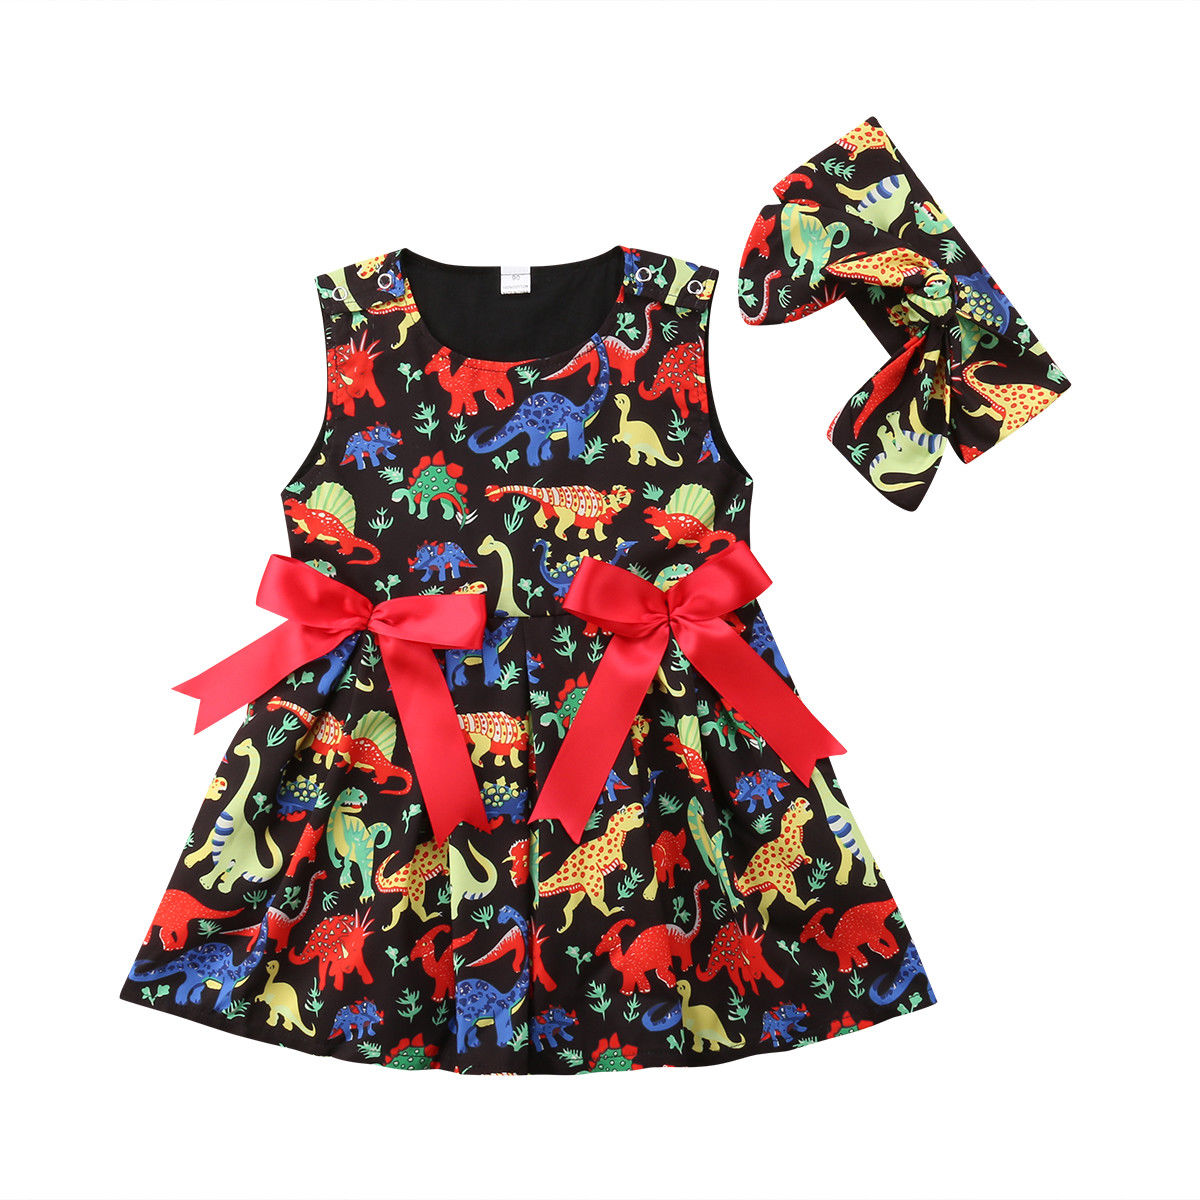 1-6 T bebé niña ropa dinosaurio vestido sin mangas bowknot Vestidos lindo animal estampado trajes niños meisjes jurk